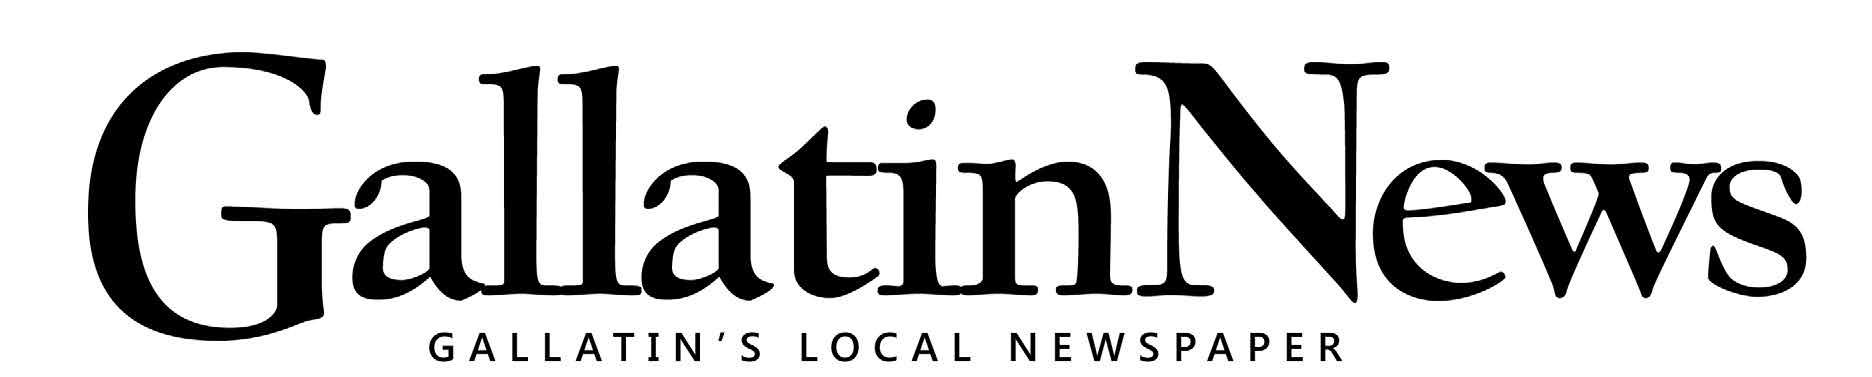 The Gallatin News logo 2014.jpg